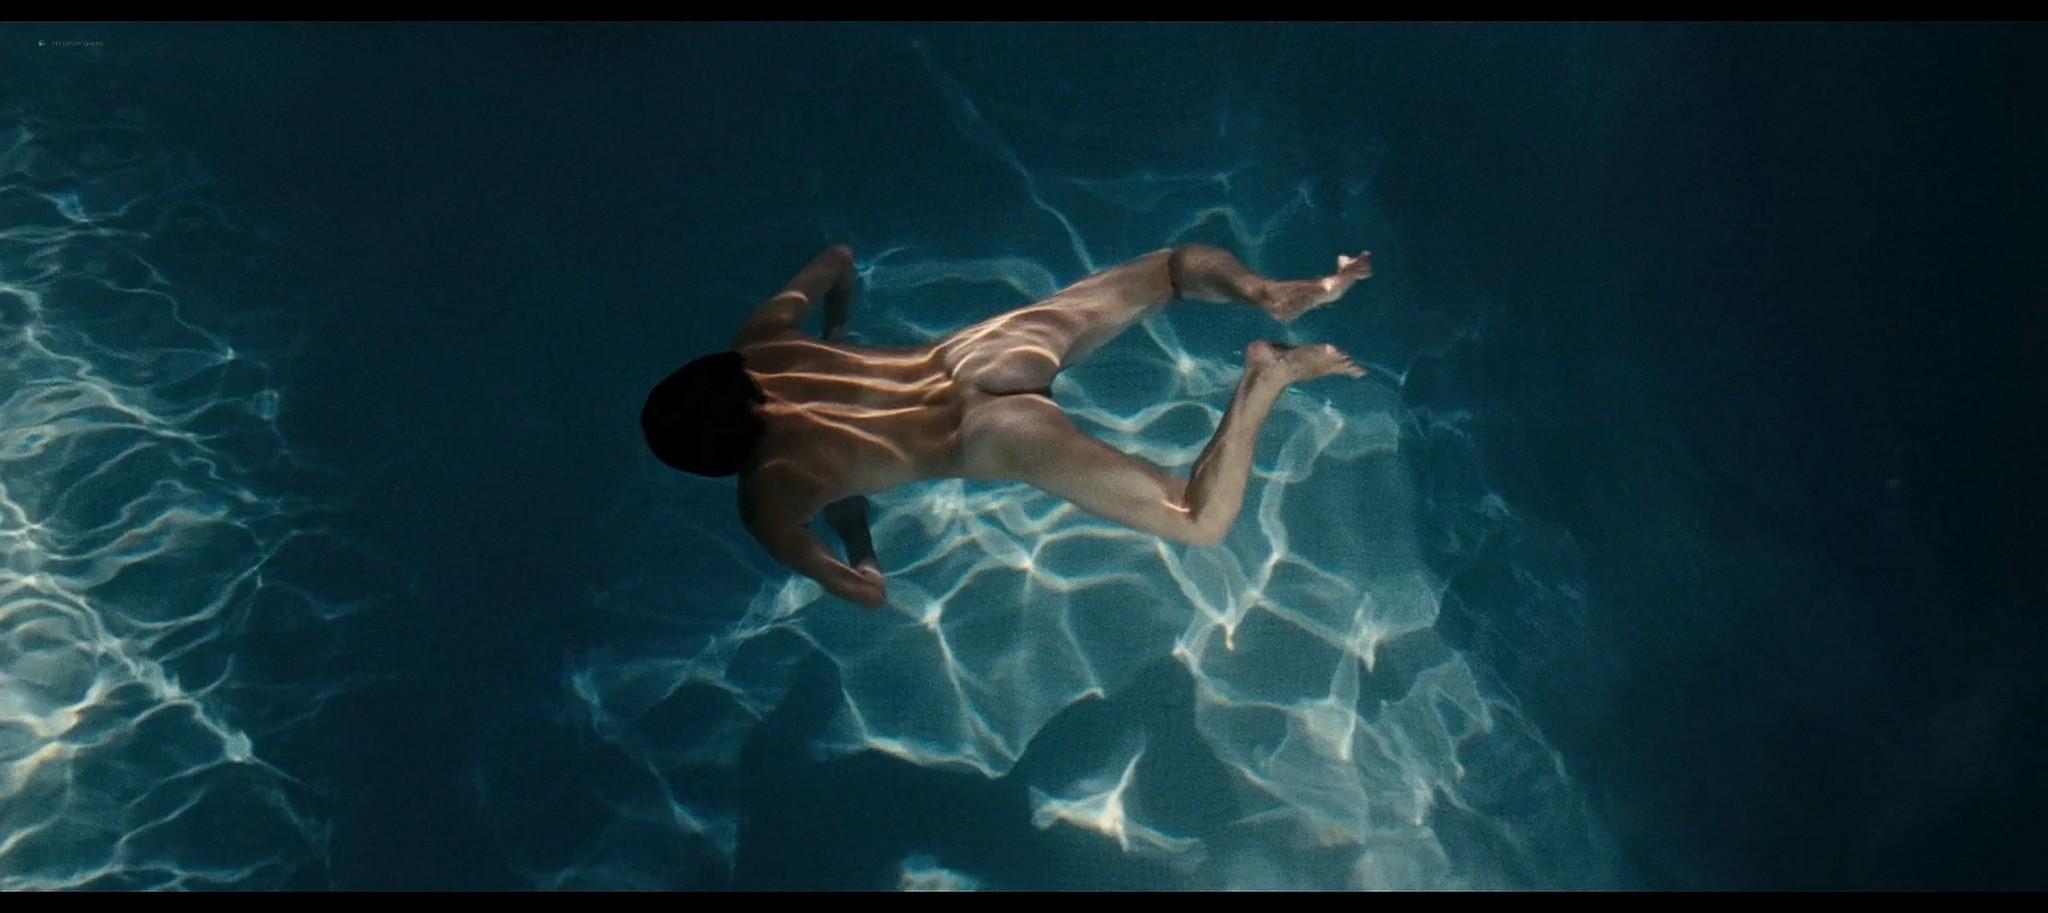 Sabrina Ferilli nude Anita Kravos full frontal Galatea Ranzi and others nude and sexy The Great Beauty IT 2013 1080p BluRey 10